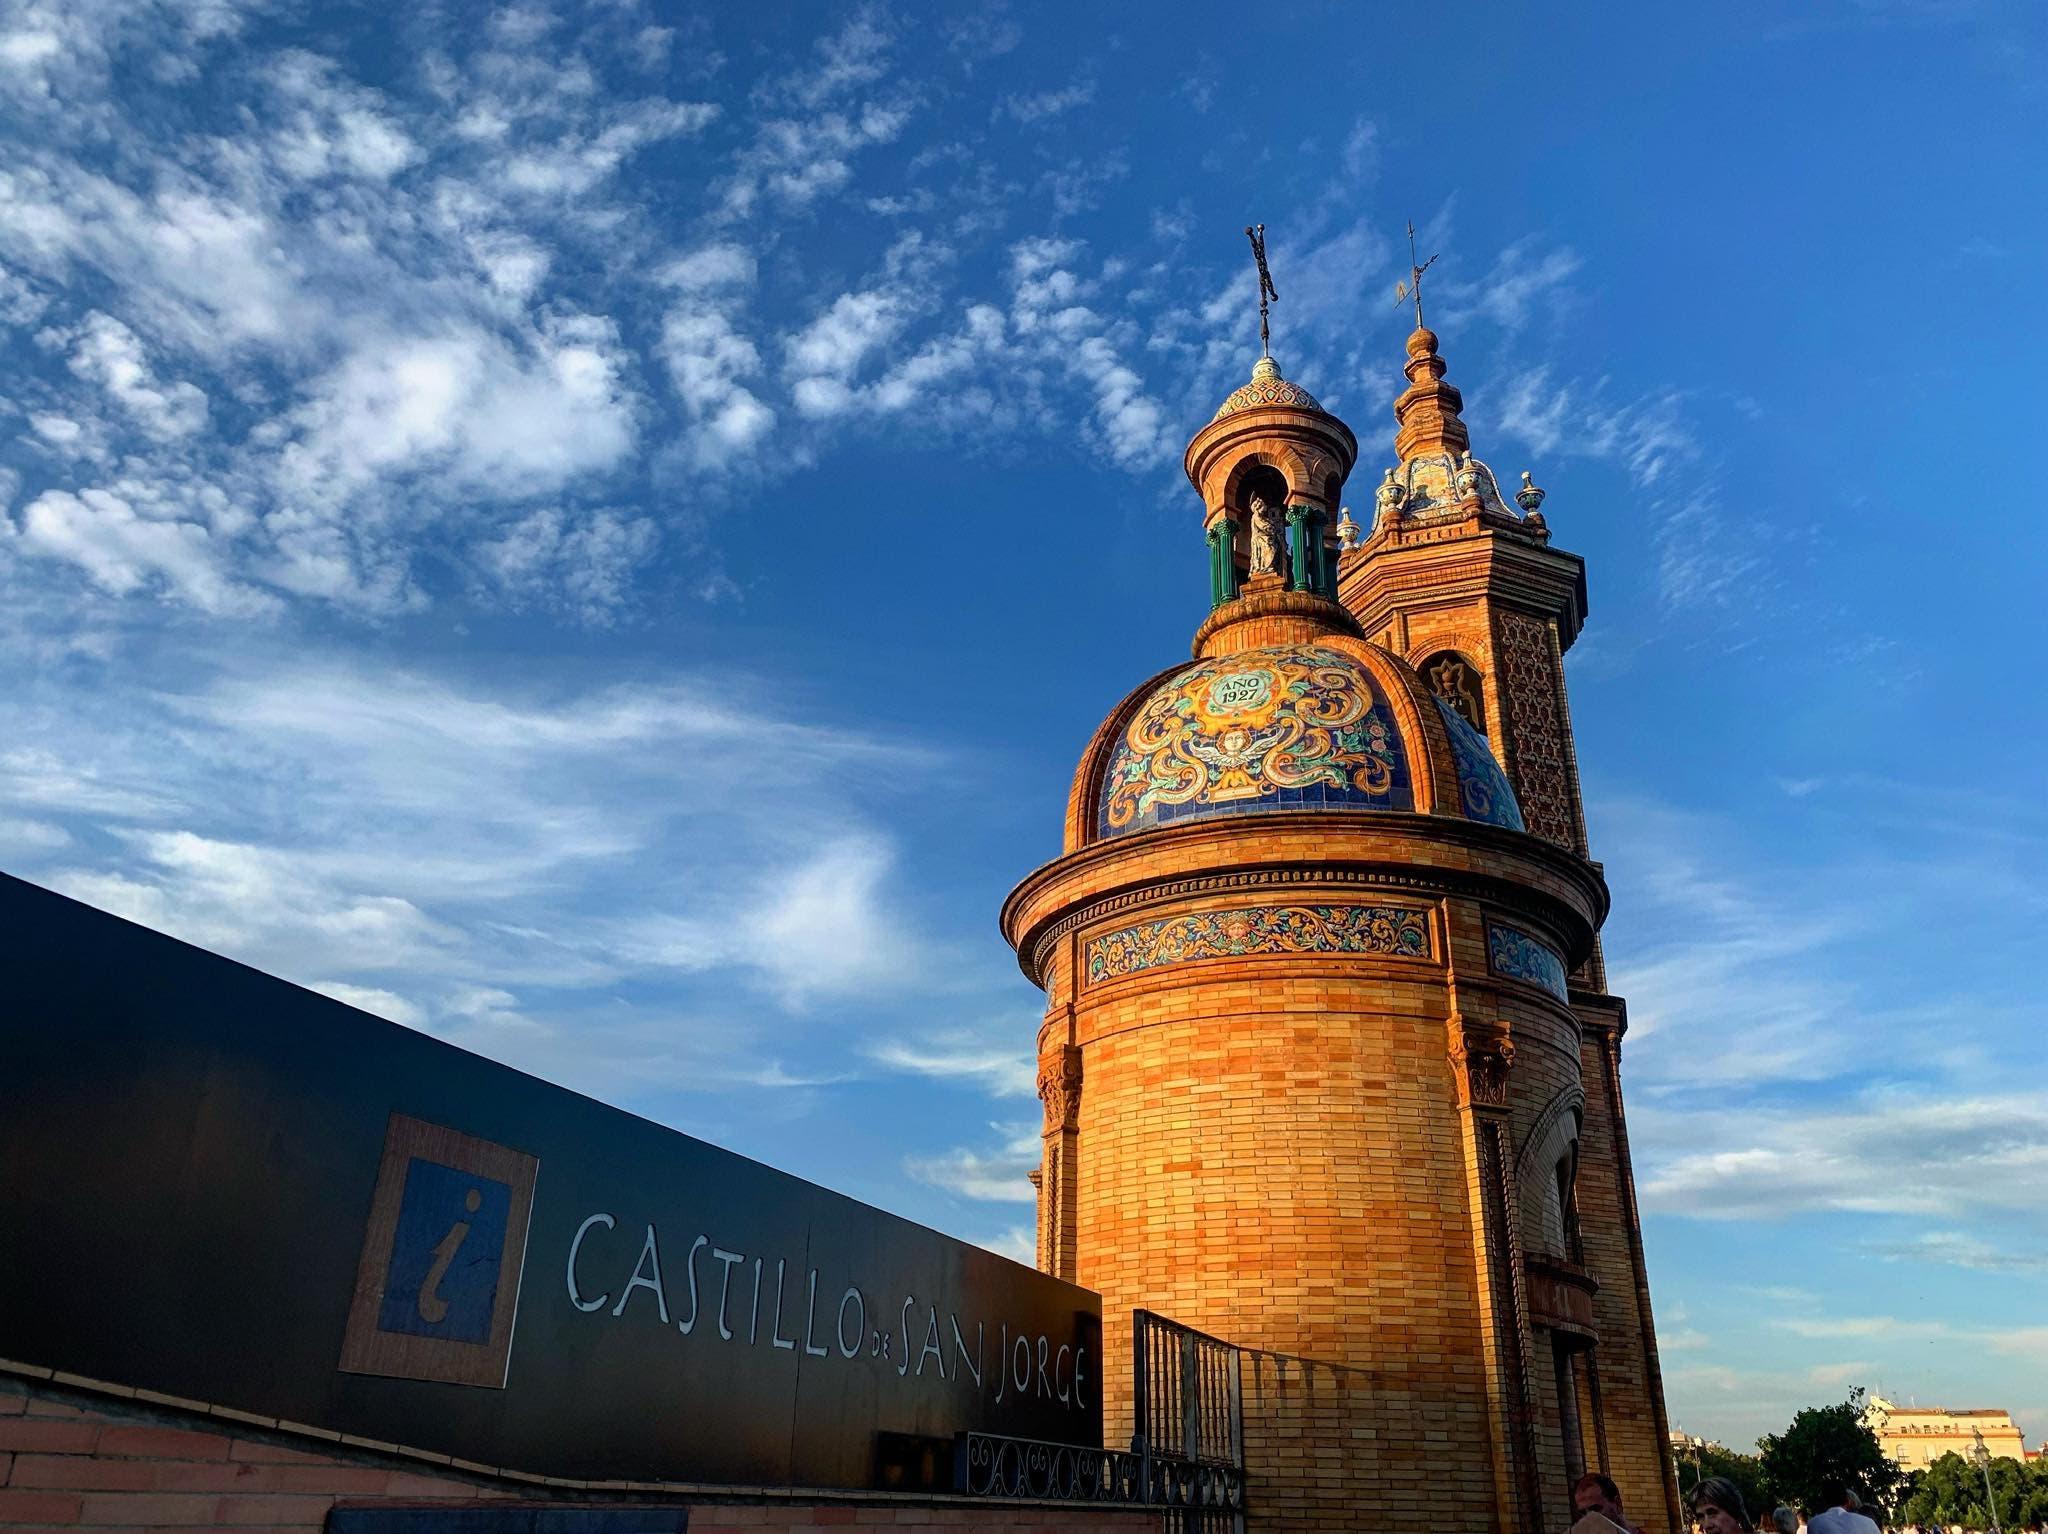 Castillo De San Jorge Triana